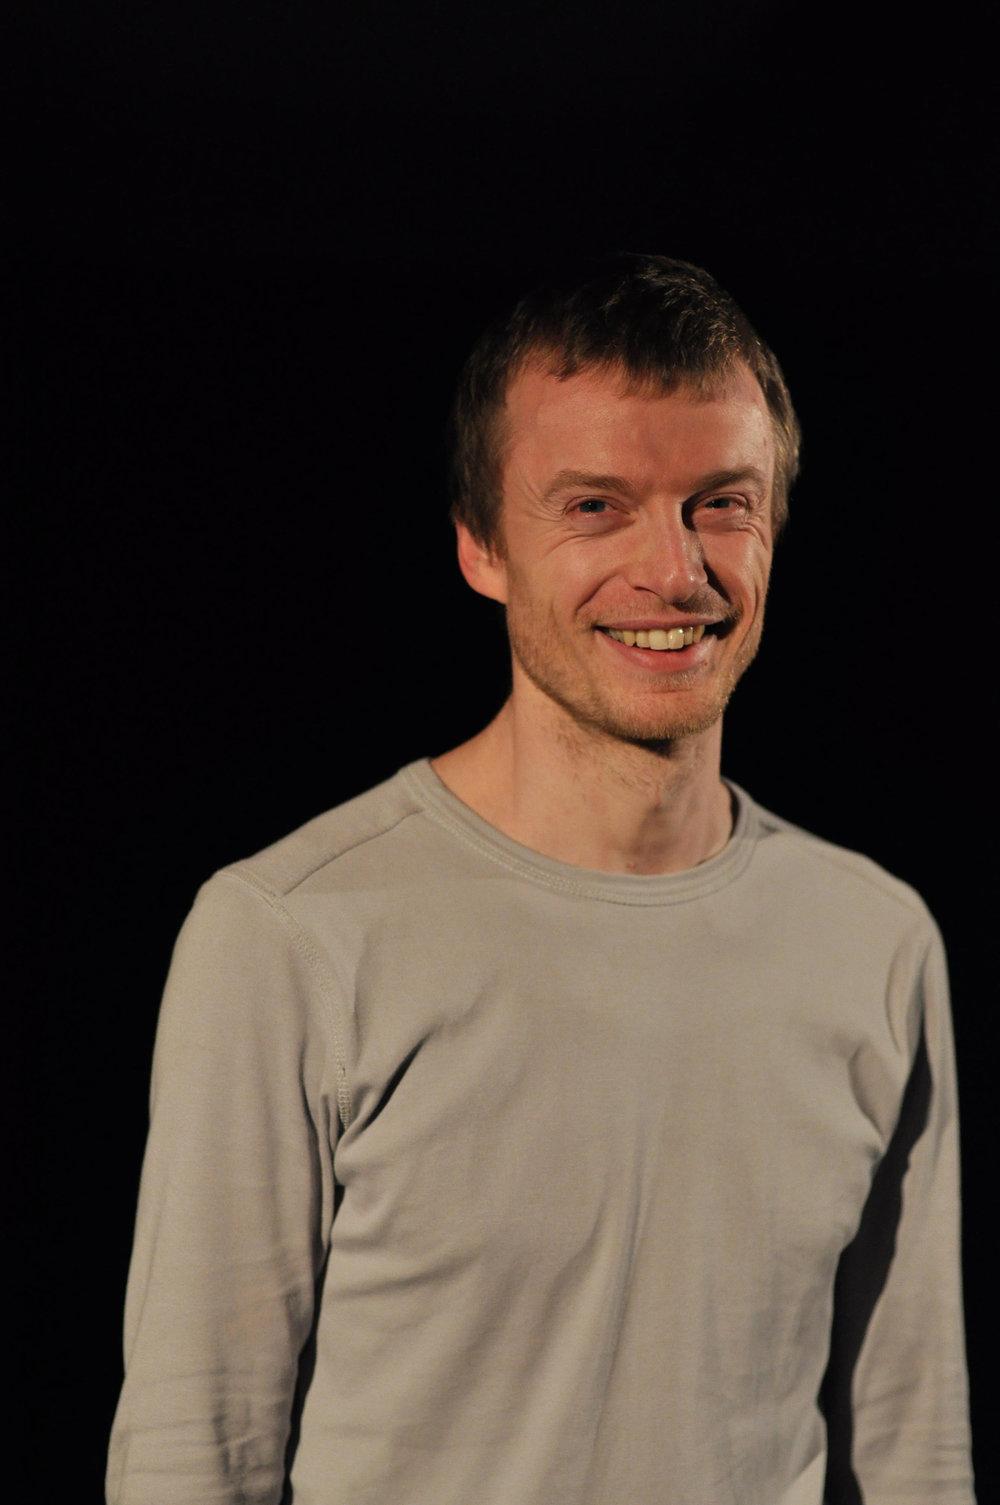 Robert Janč portrét1.jpg